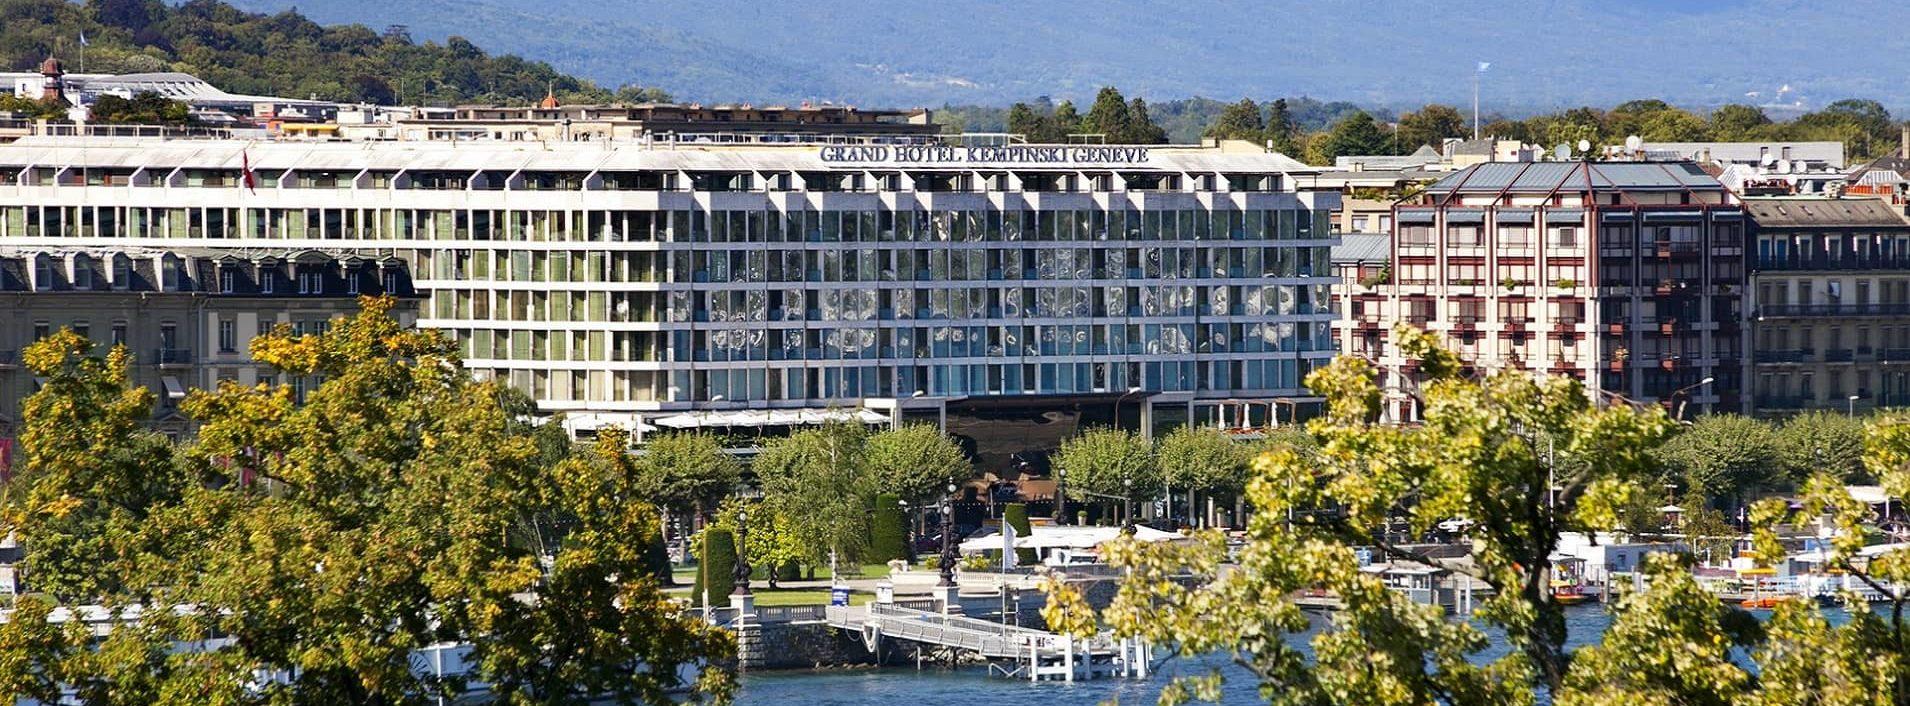 Visite des étudiants ANIFOR au Grand Hotel Kempinski Geneva